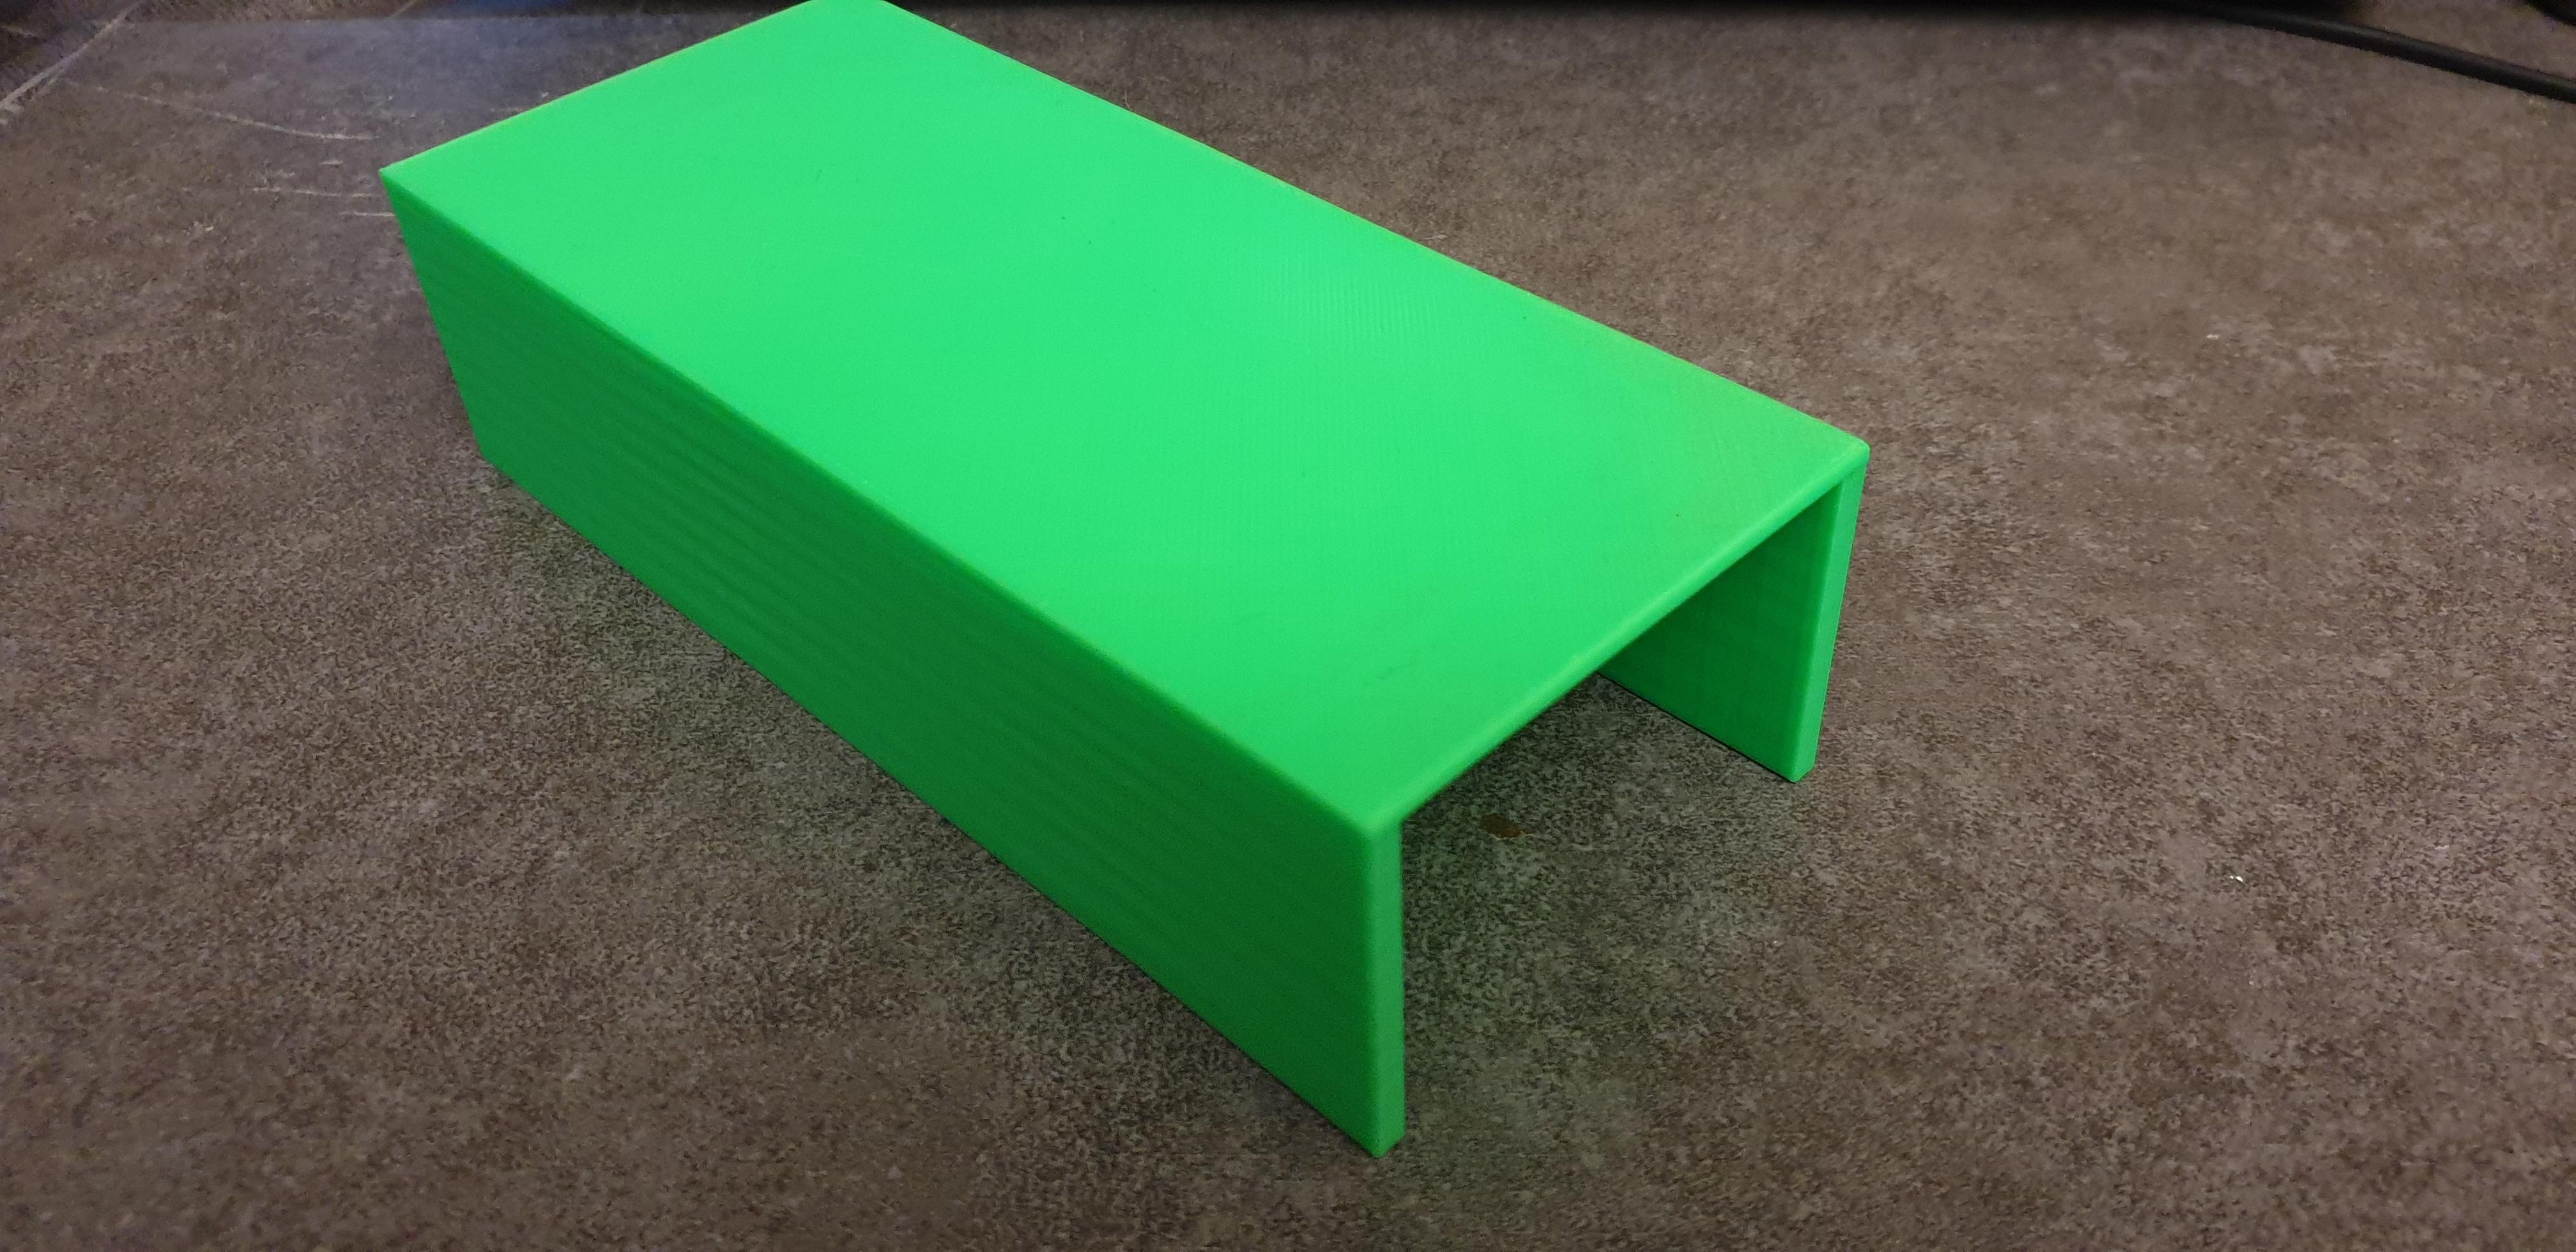 20200125_213112.jpg Download free STL file JVC RM-LP100 Tally Box (arduino optocoupler circuit box) • 3D printing model, CMH